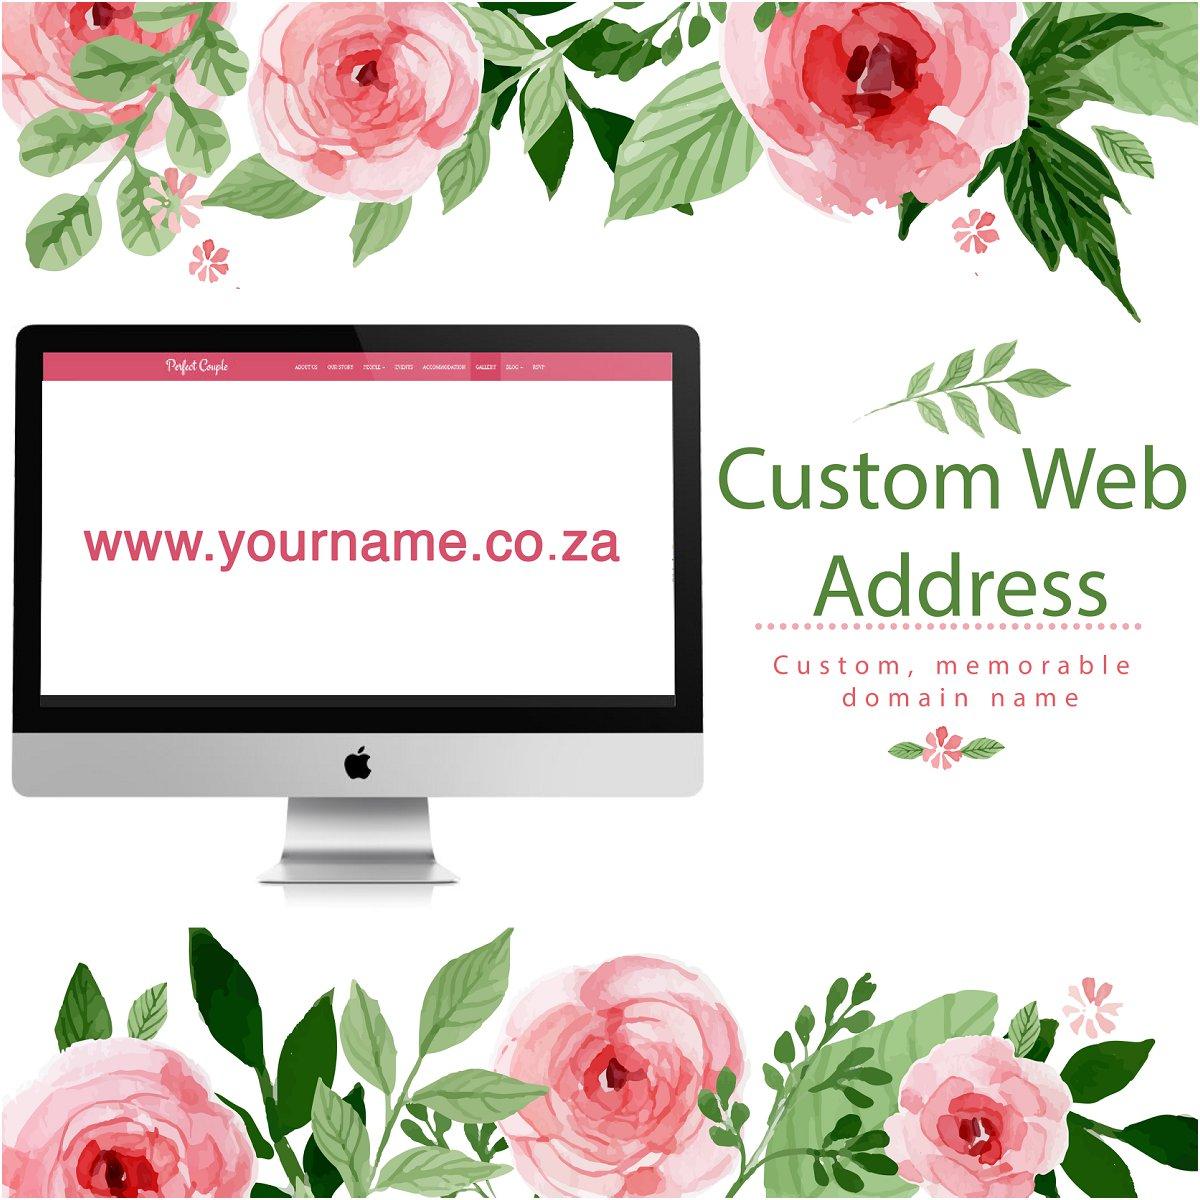 custom web address